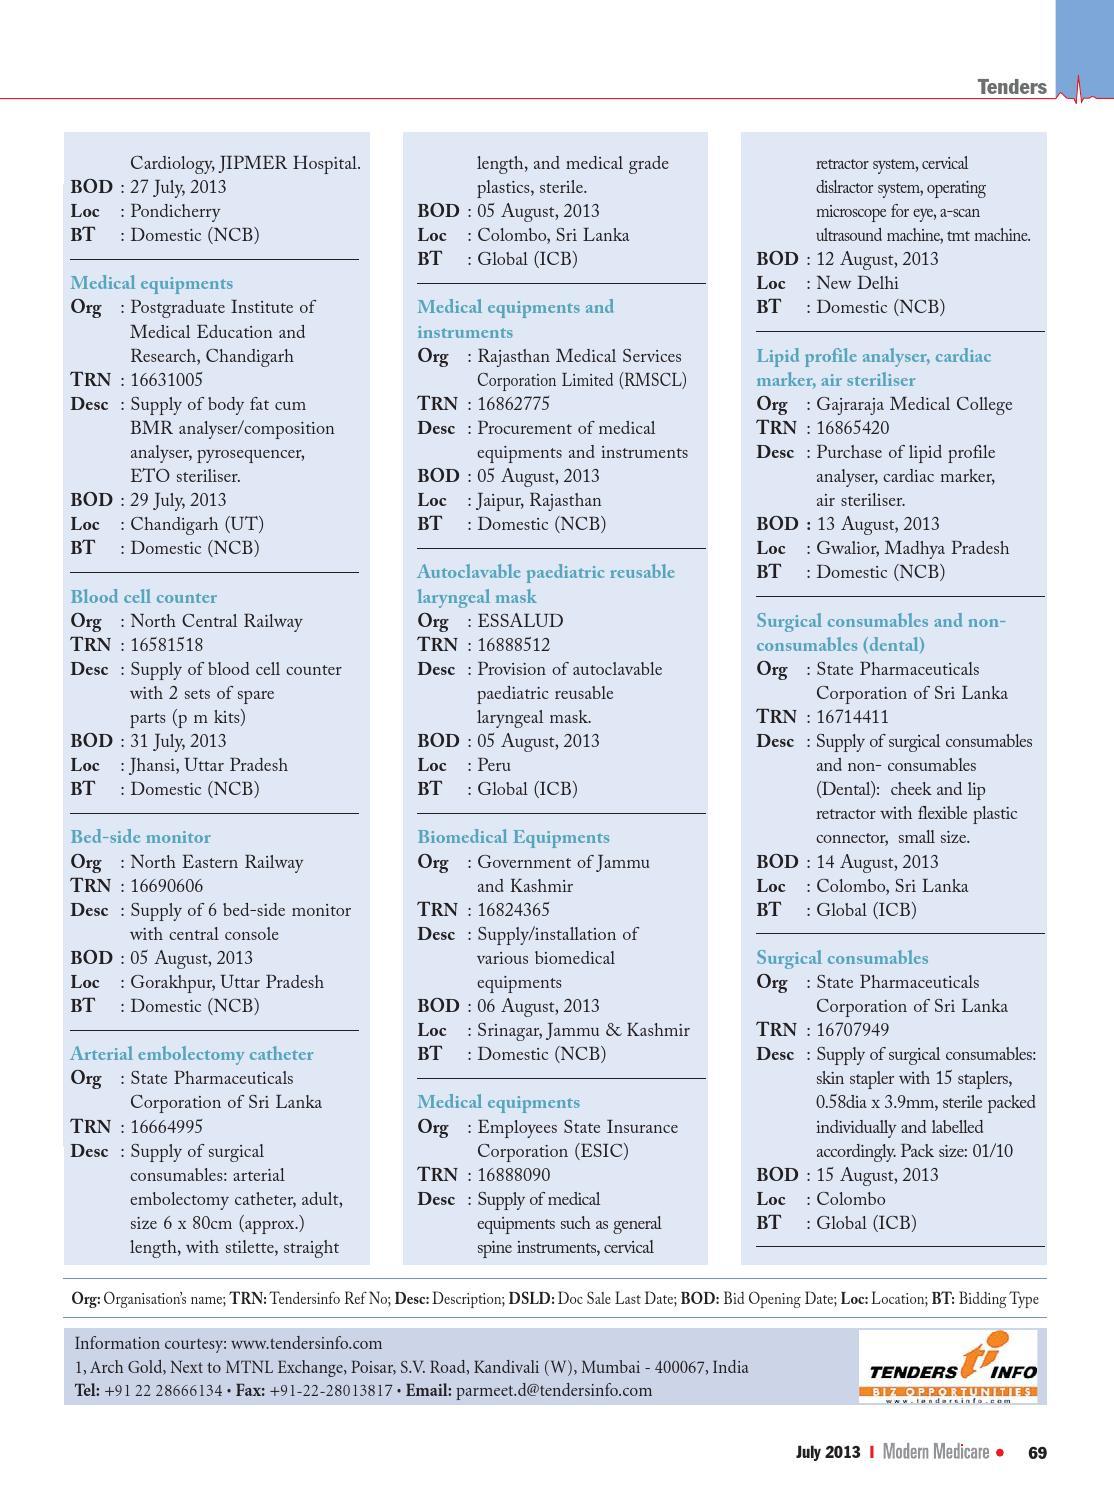 Modern Medicare july 2013 by Infomedia18 - issuu